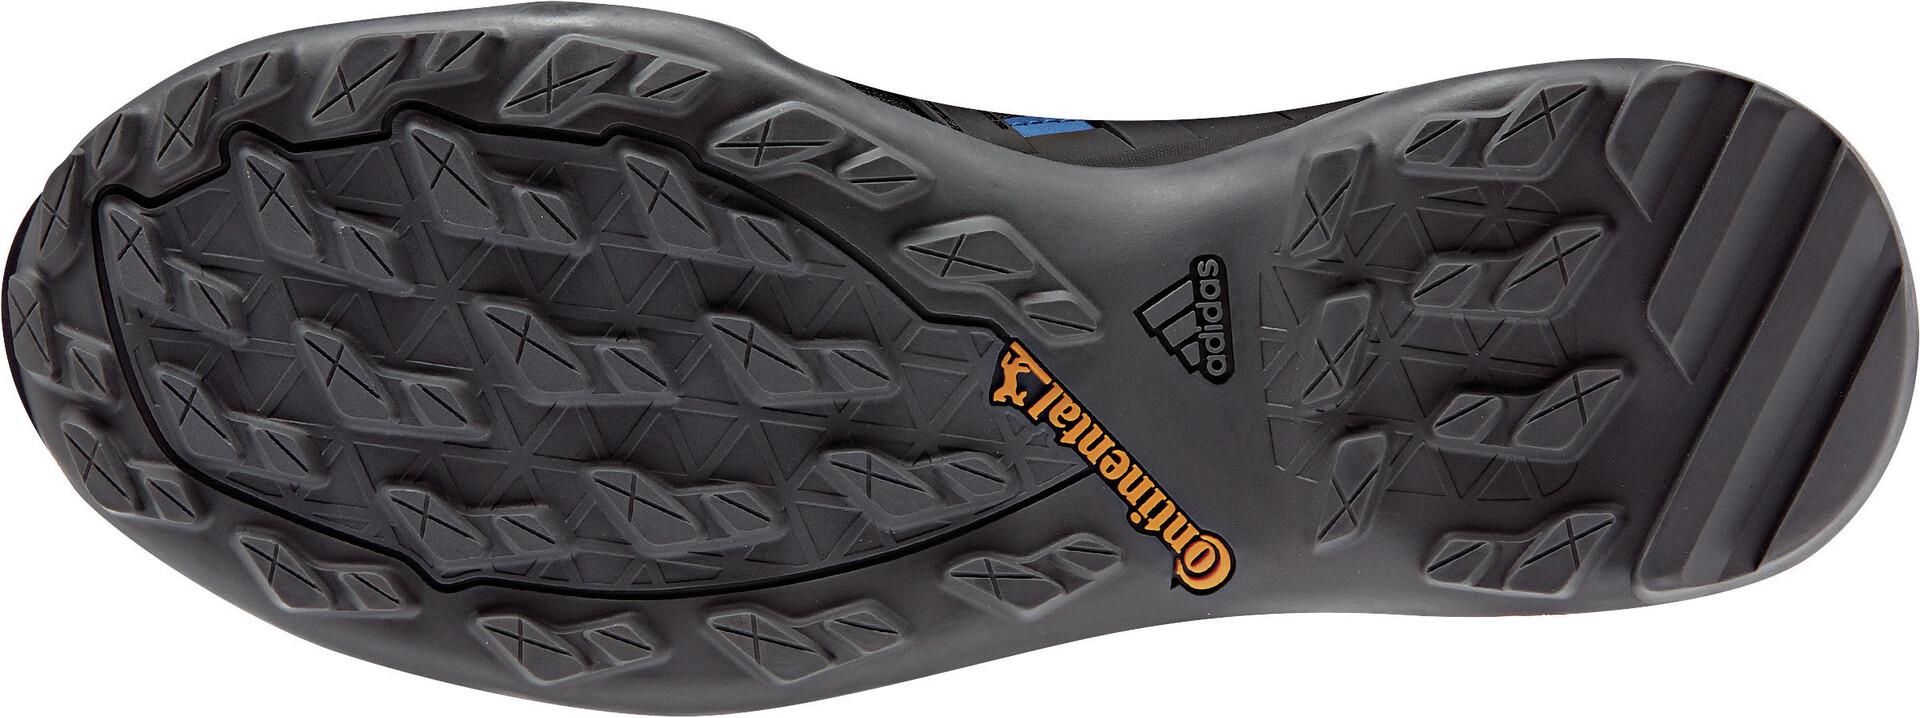 adidas TERREX Swift R2 GTX Shoes Herren core blackcore blackbright blue